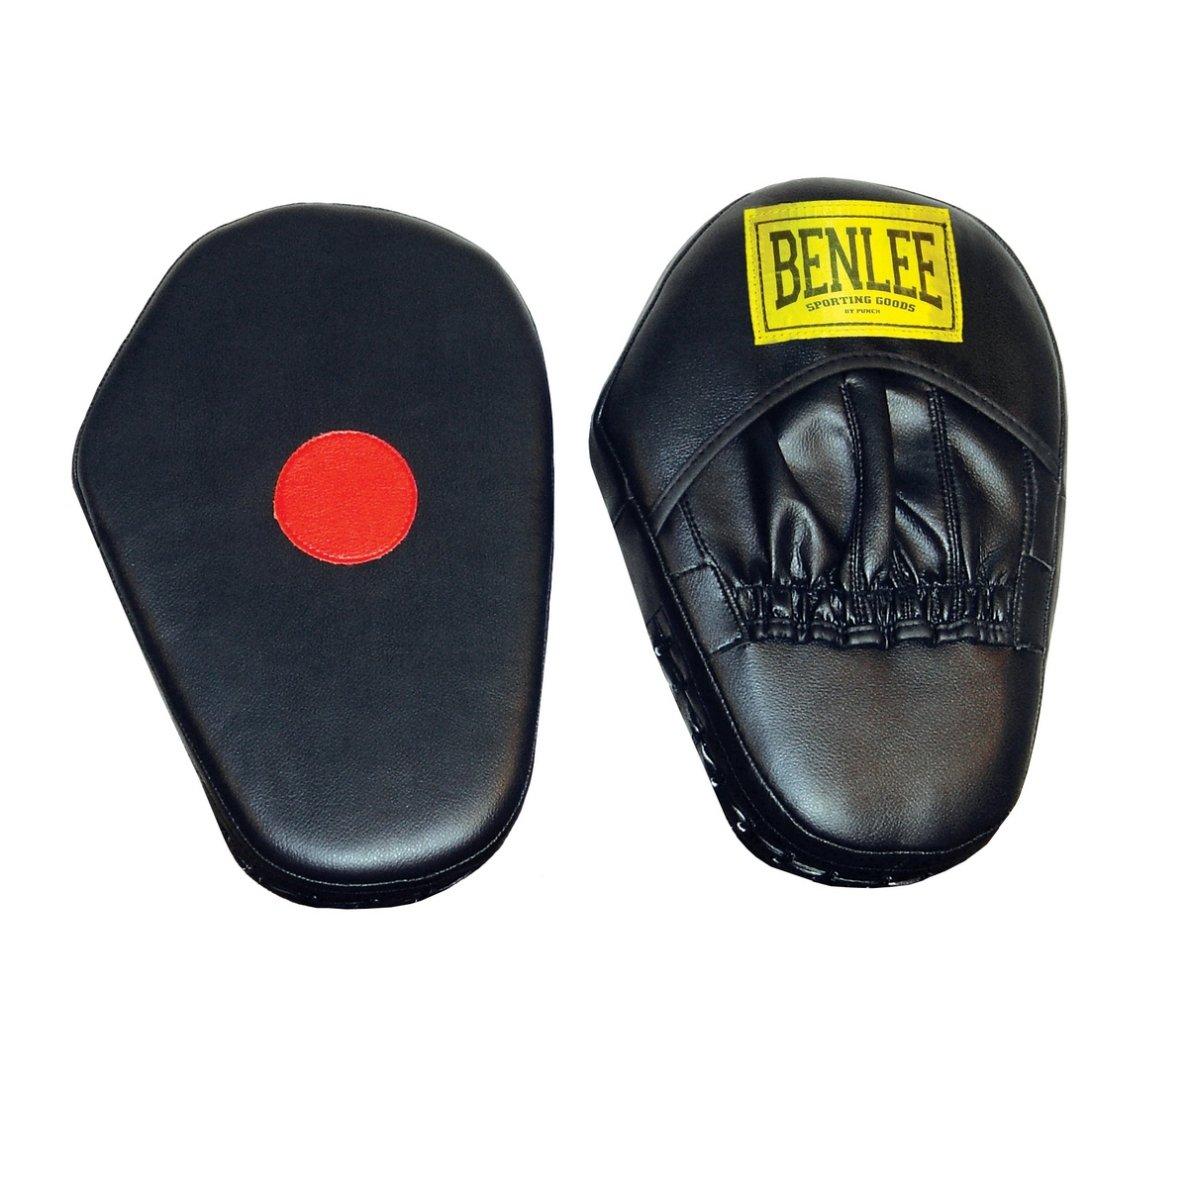 Ben Lee Benlee Rocky - Pao de Rusia de boxeo, tamaño único, color negro 195022 195022_1503-000